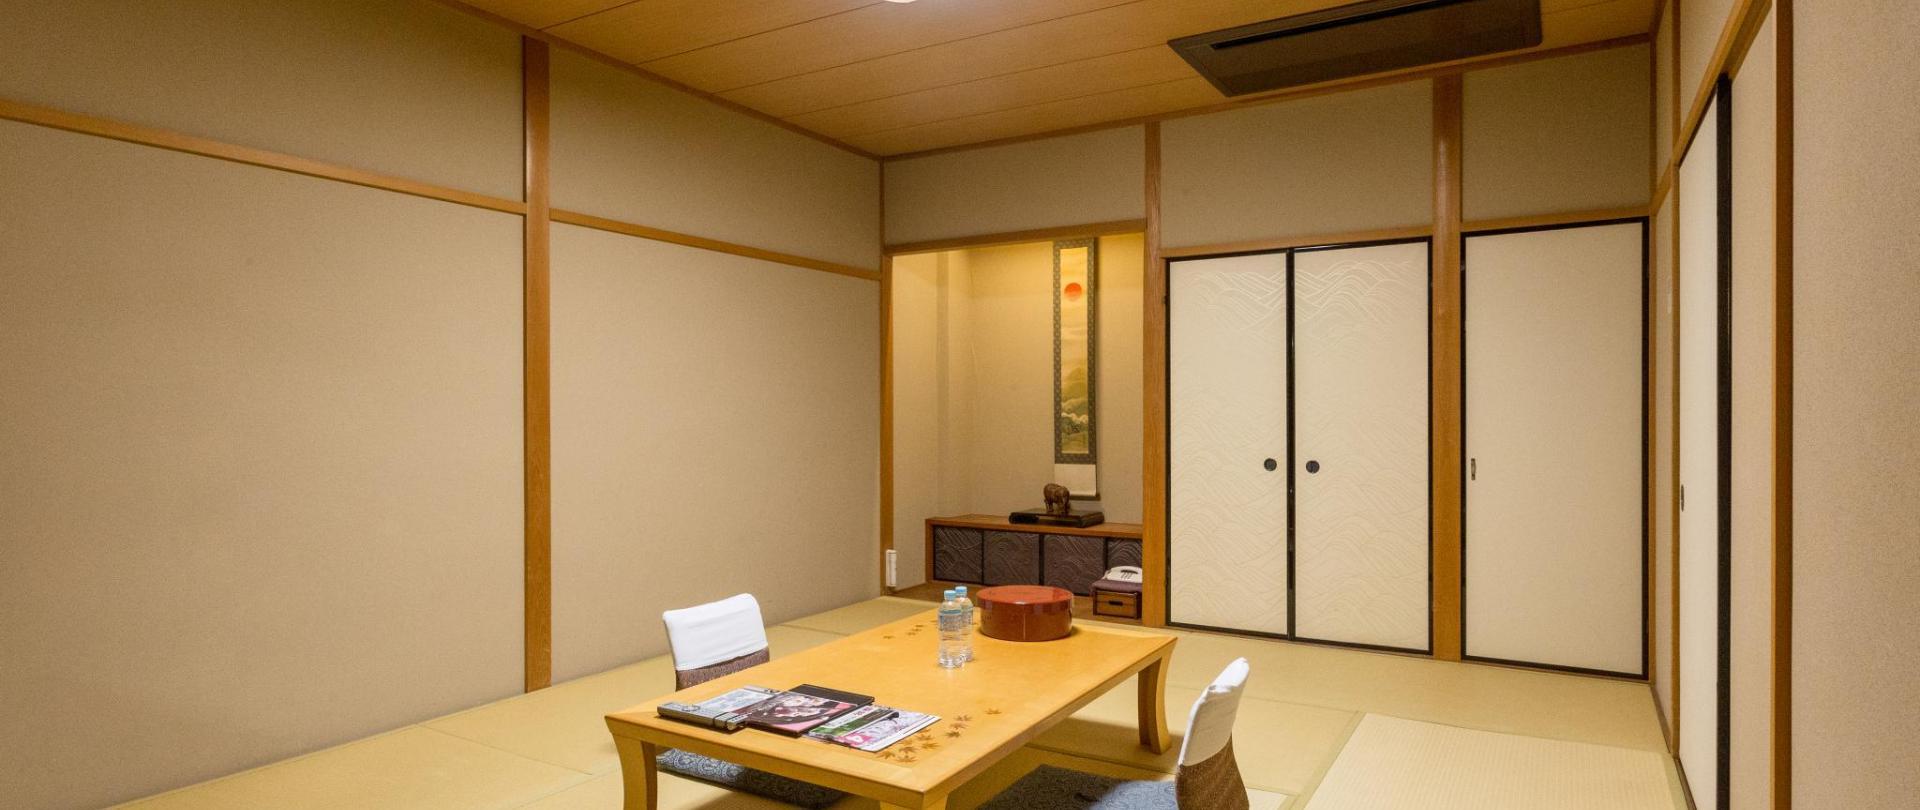 20170427yachiyo_shinkan_001.jpg